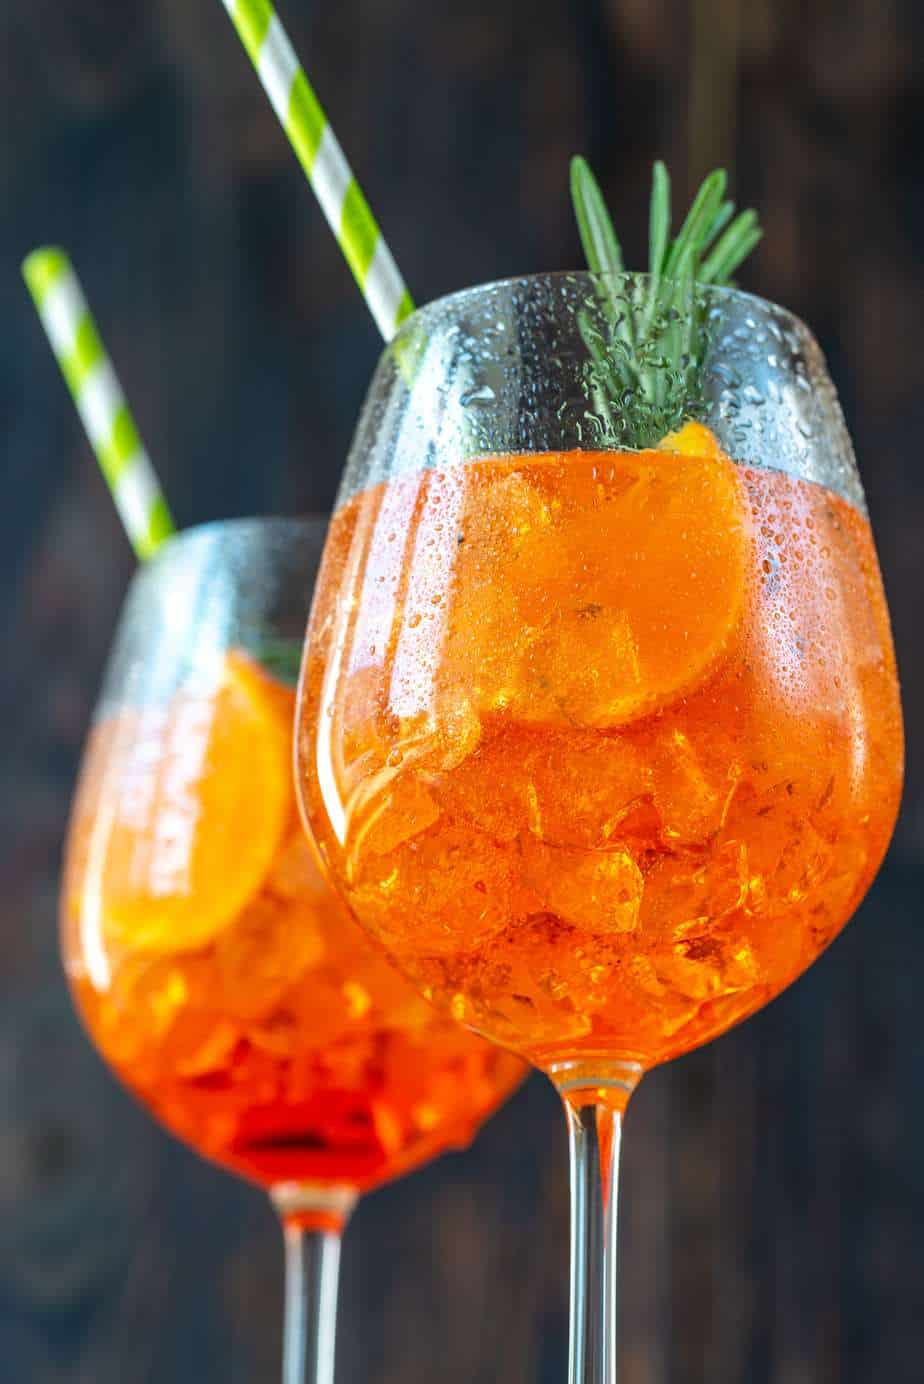 glasses-of-aperol-spritz-cocktail-FHB8MCU-min